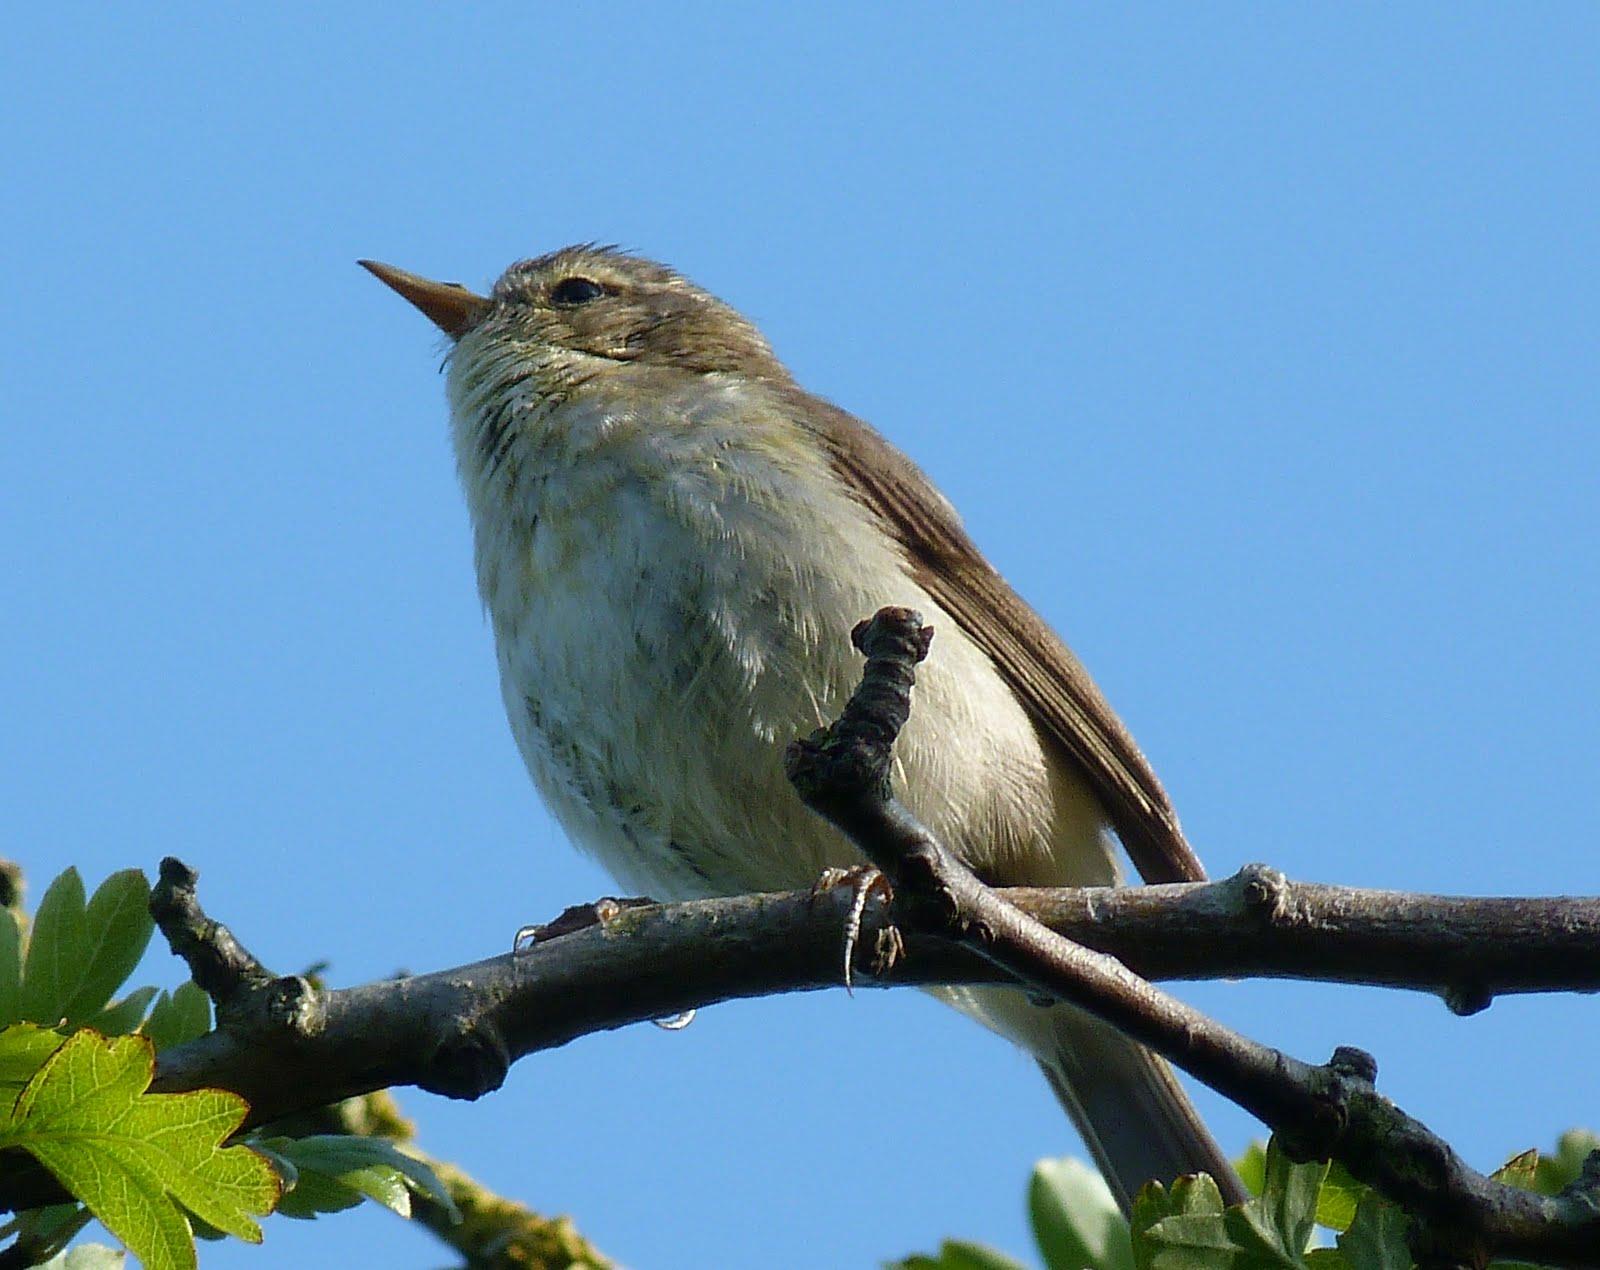 BOC bird sightings: Sightings 13/6/11